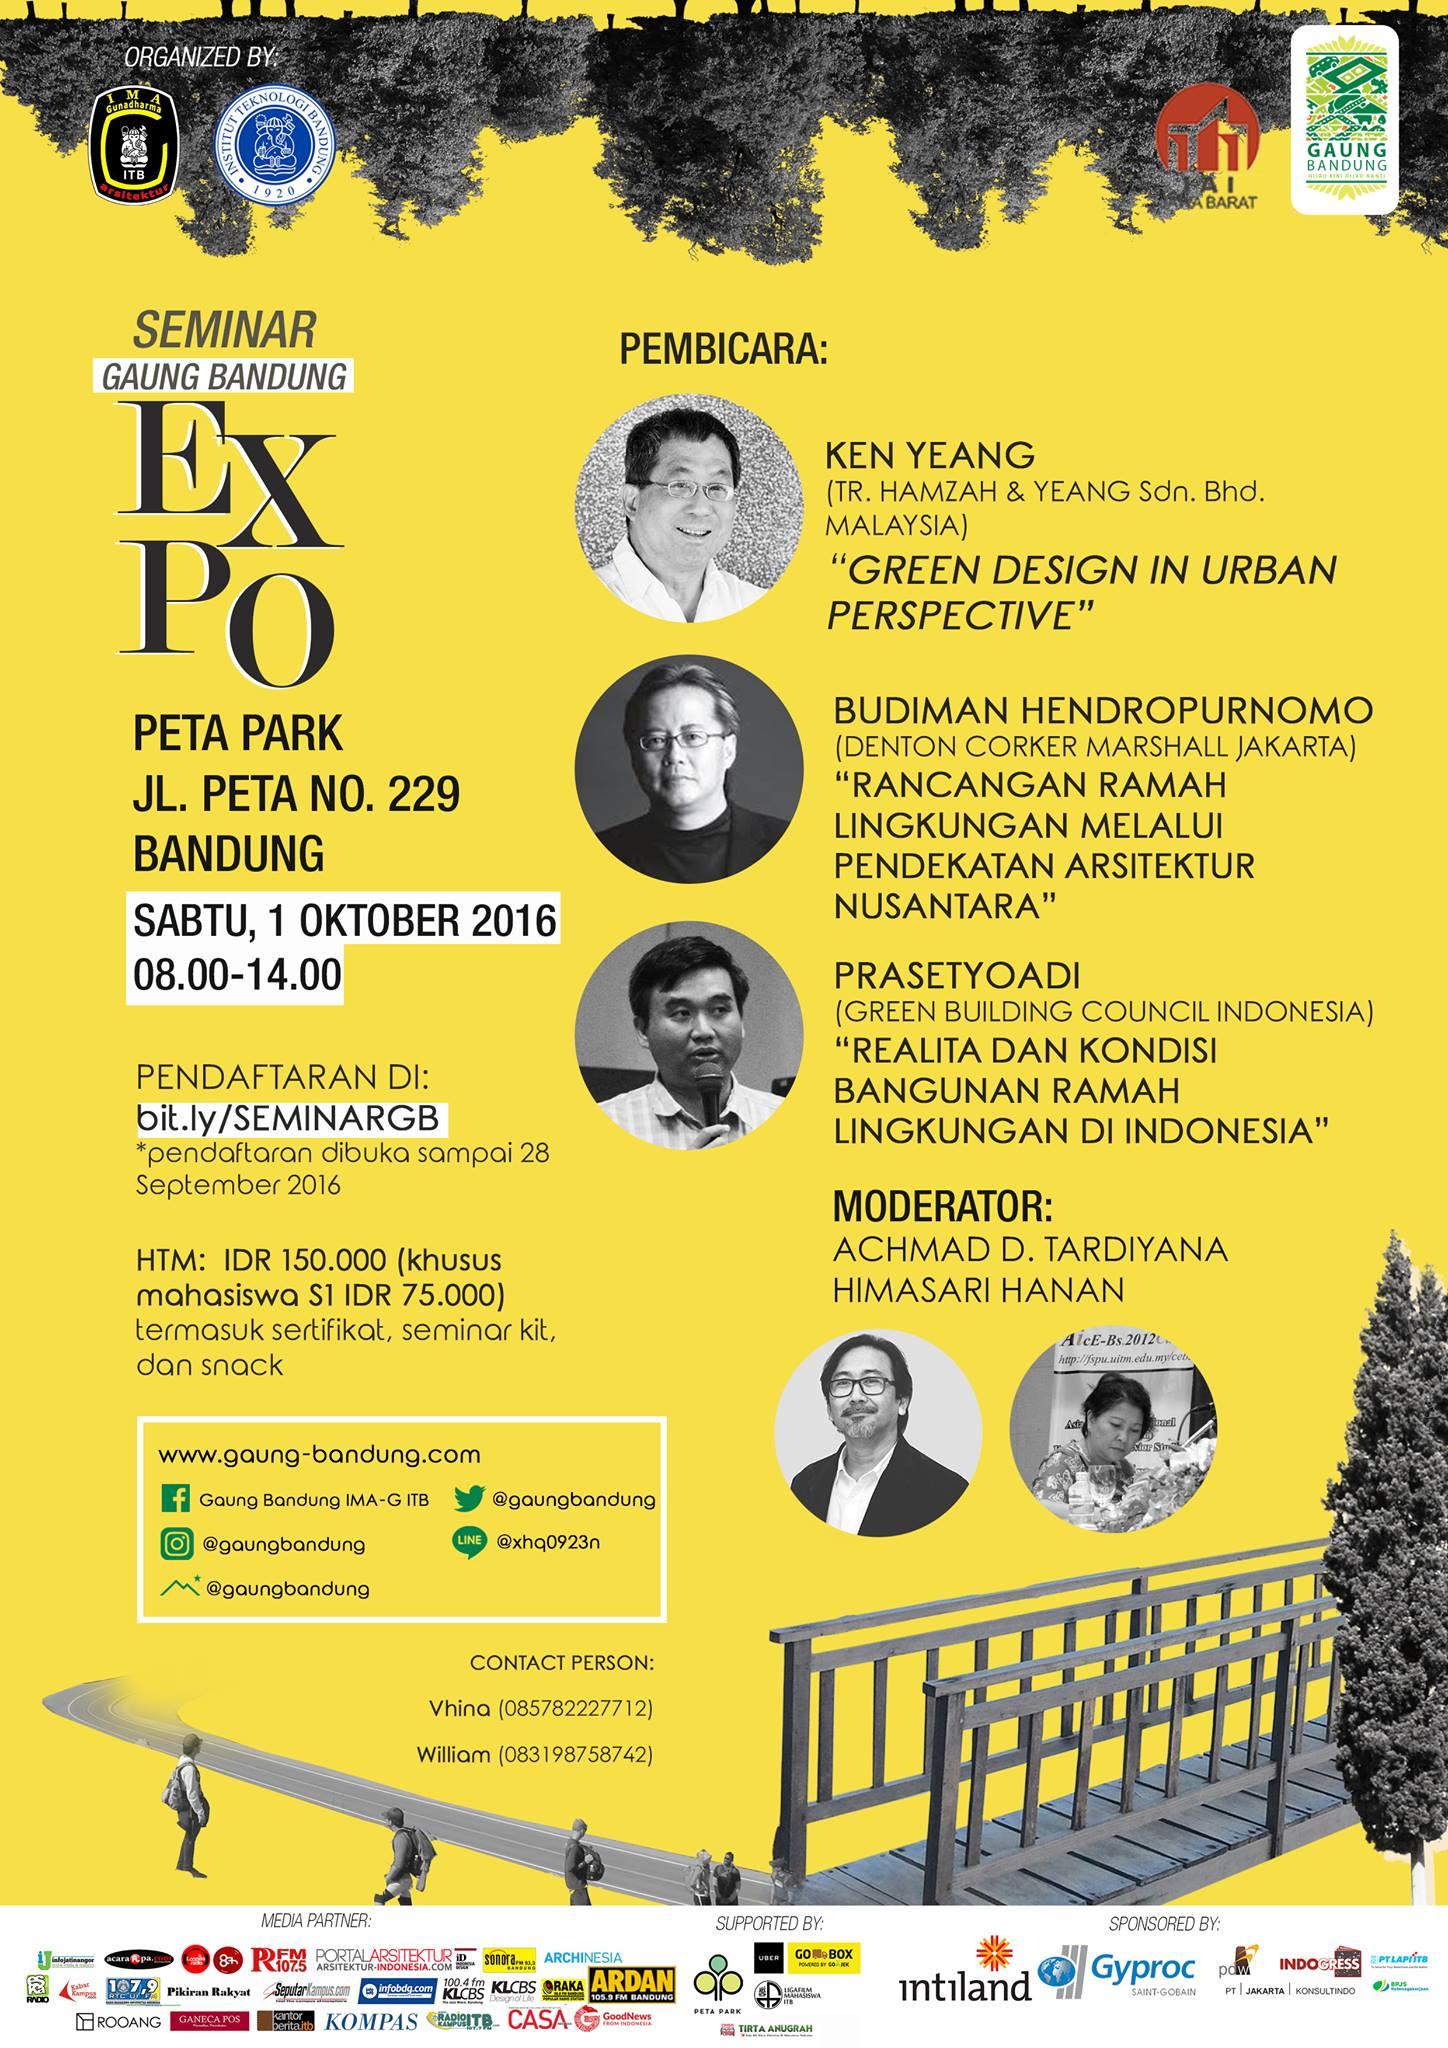 Expo Gaung Bandung 1 Oktober 2016